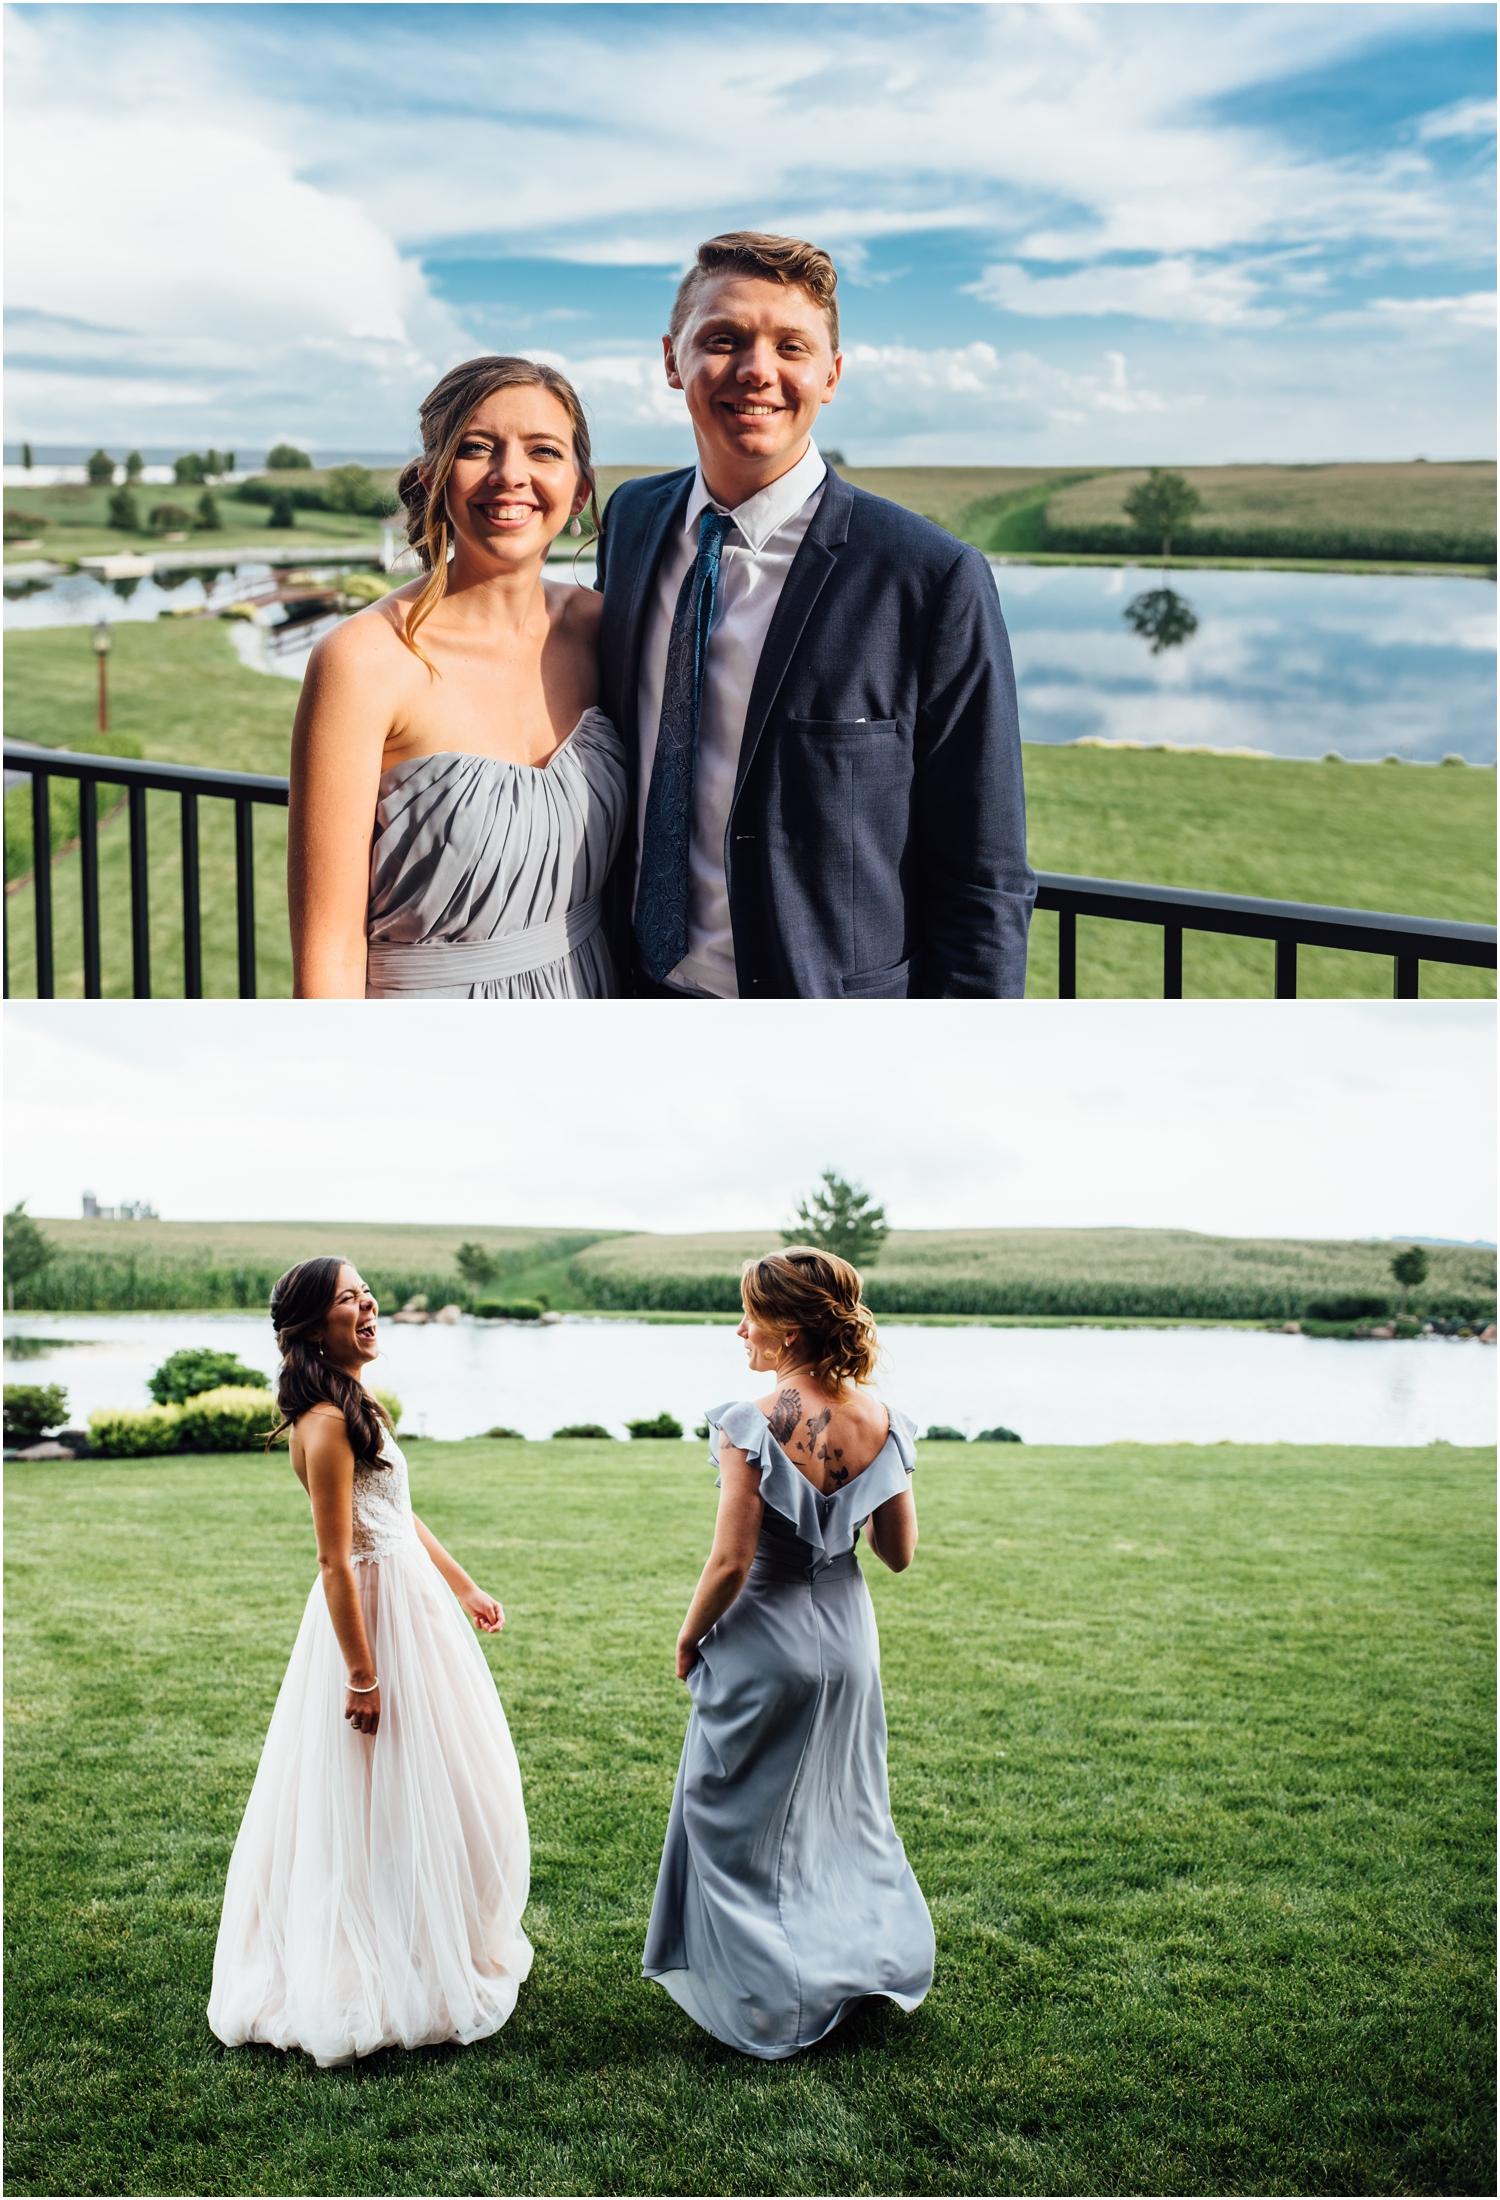 Steph&Bryan_Lancaster_wedding_farm_0546.jpg